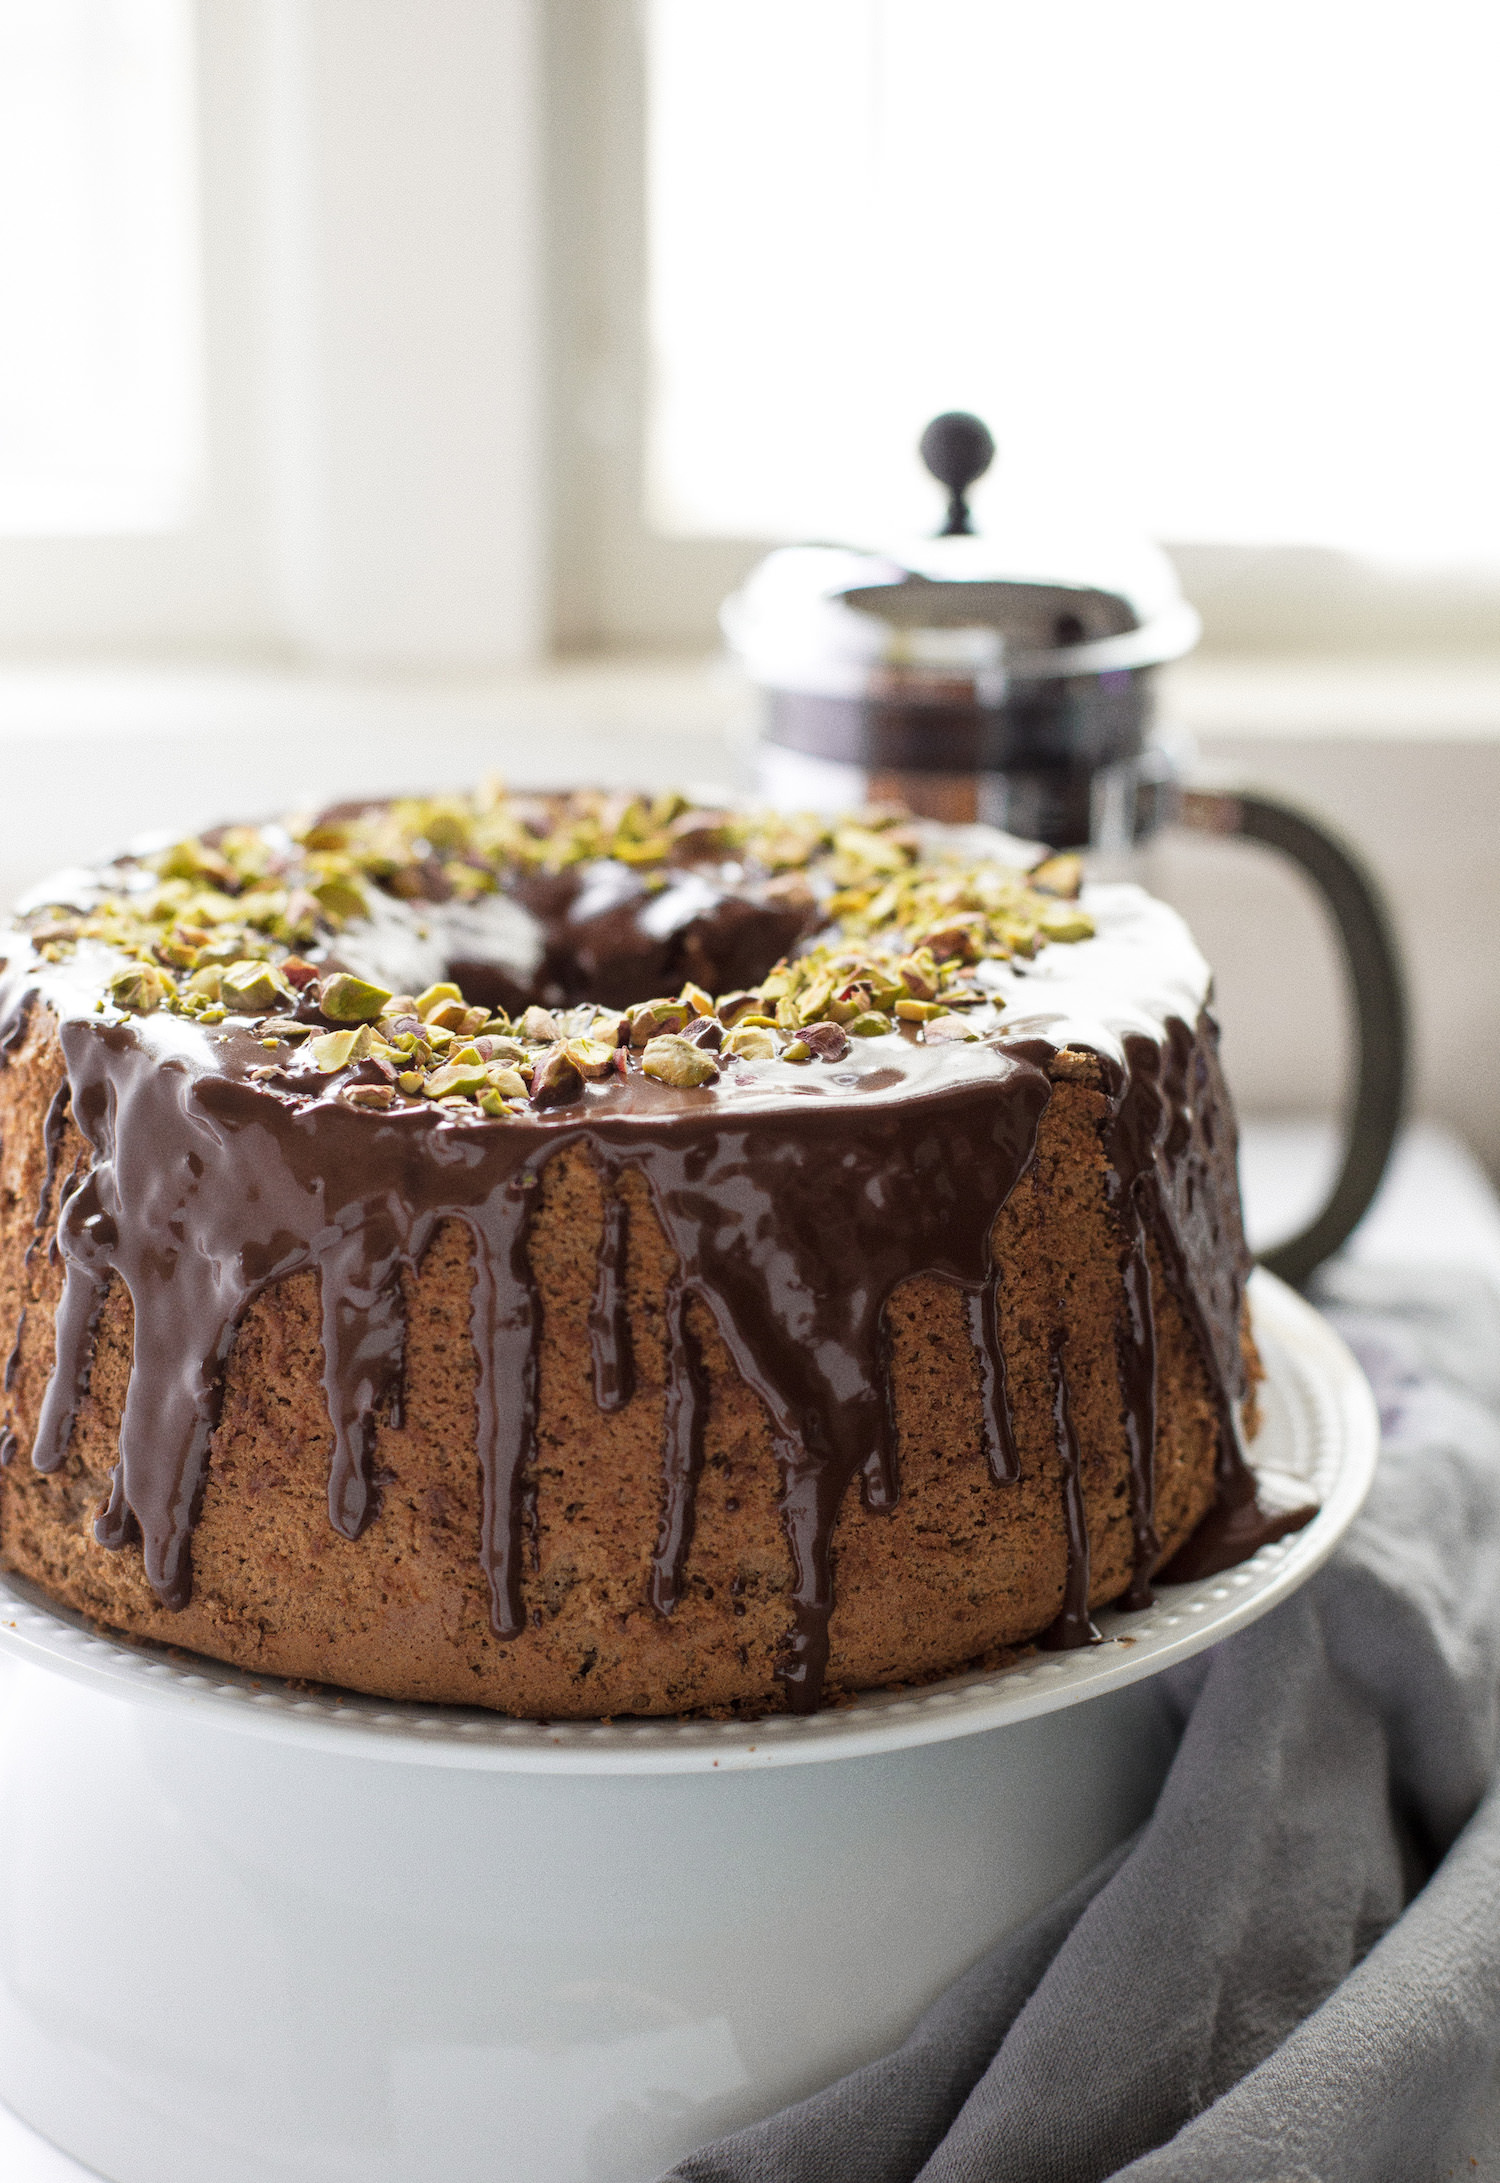 Chocolate Chiffon Cake with Ganache Glaze: fluffy, airy, light chocolate cake topped with a rich, creamy, chocolate ganache. | TrufflesandTrends.com